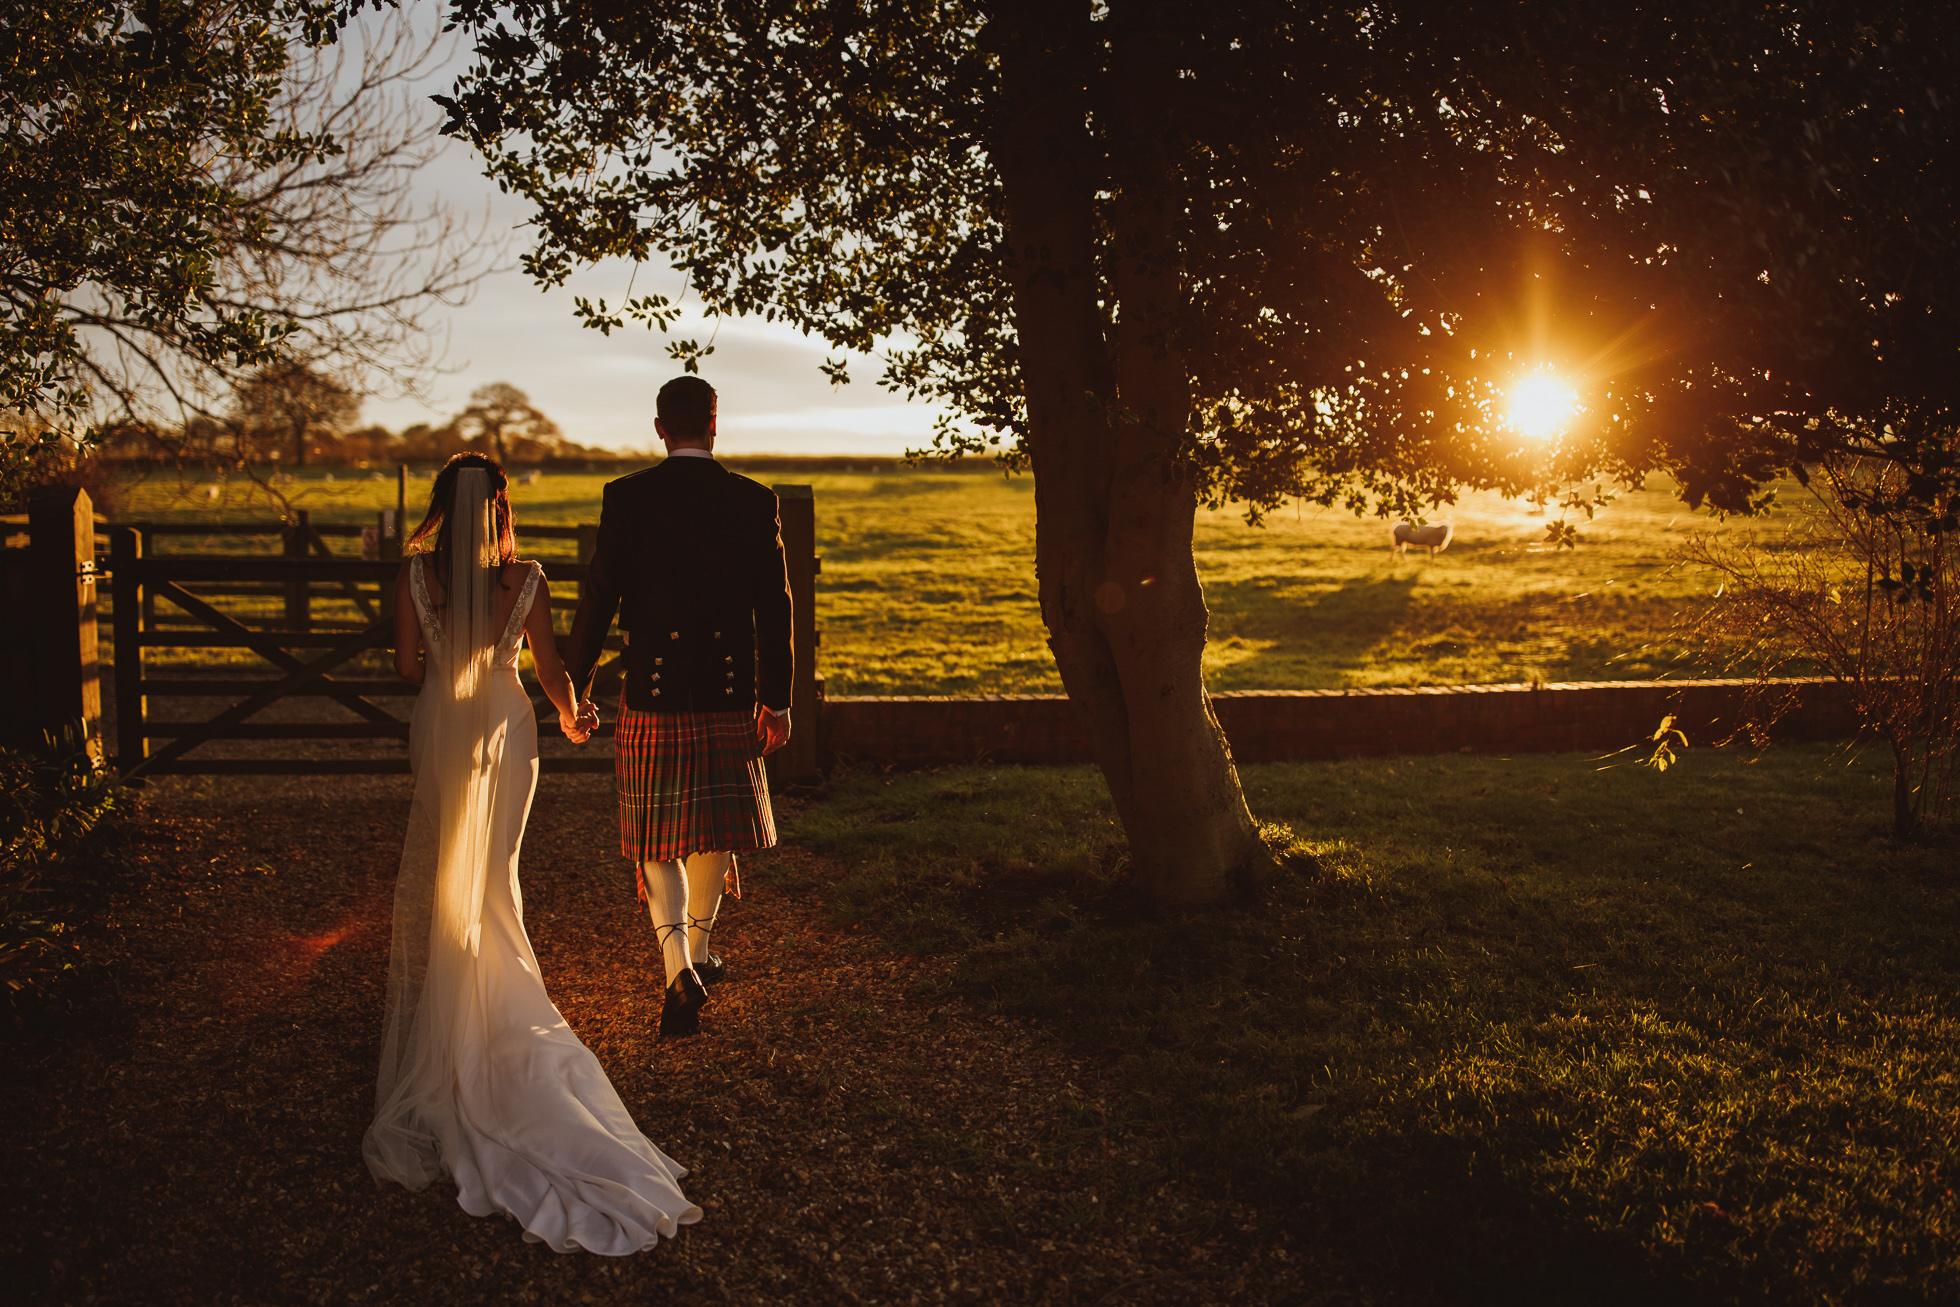 hornington_manor_wedding_photographer-56.jpg